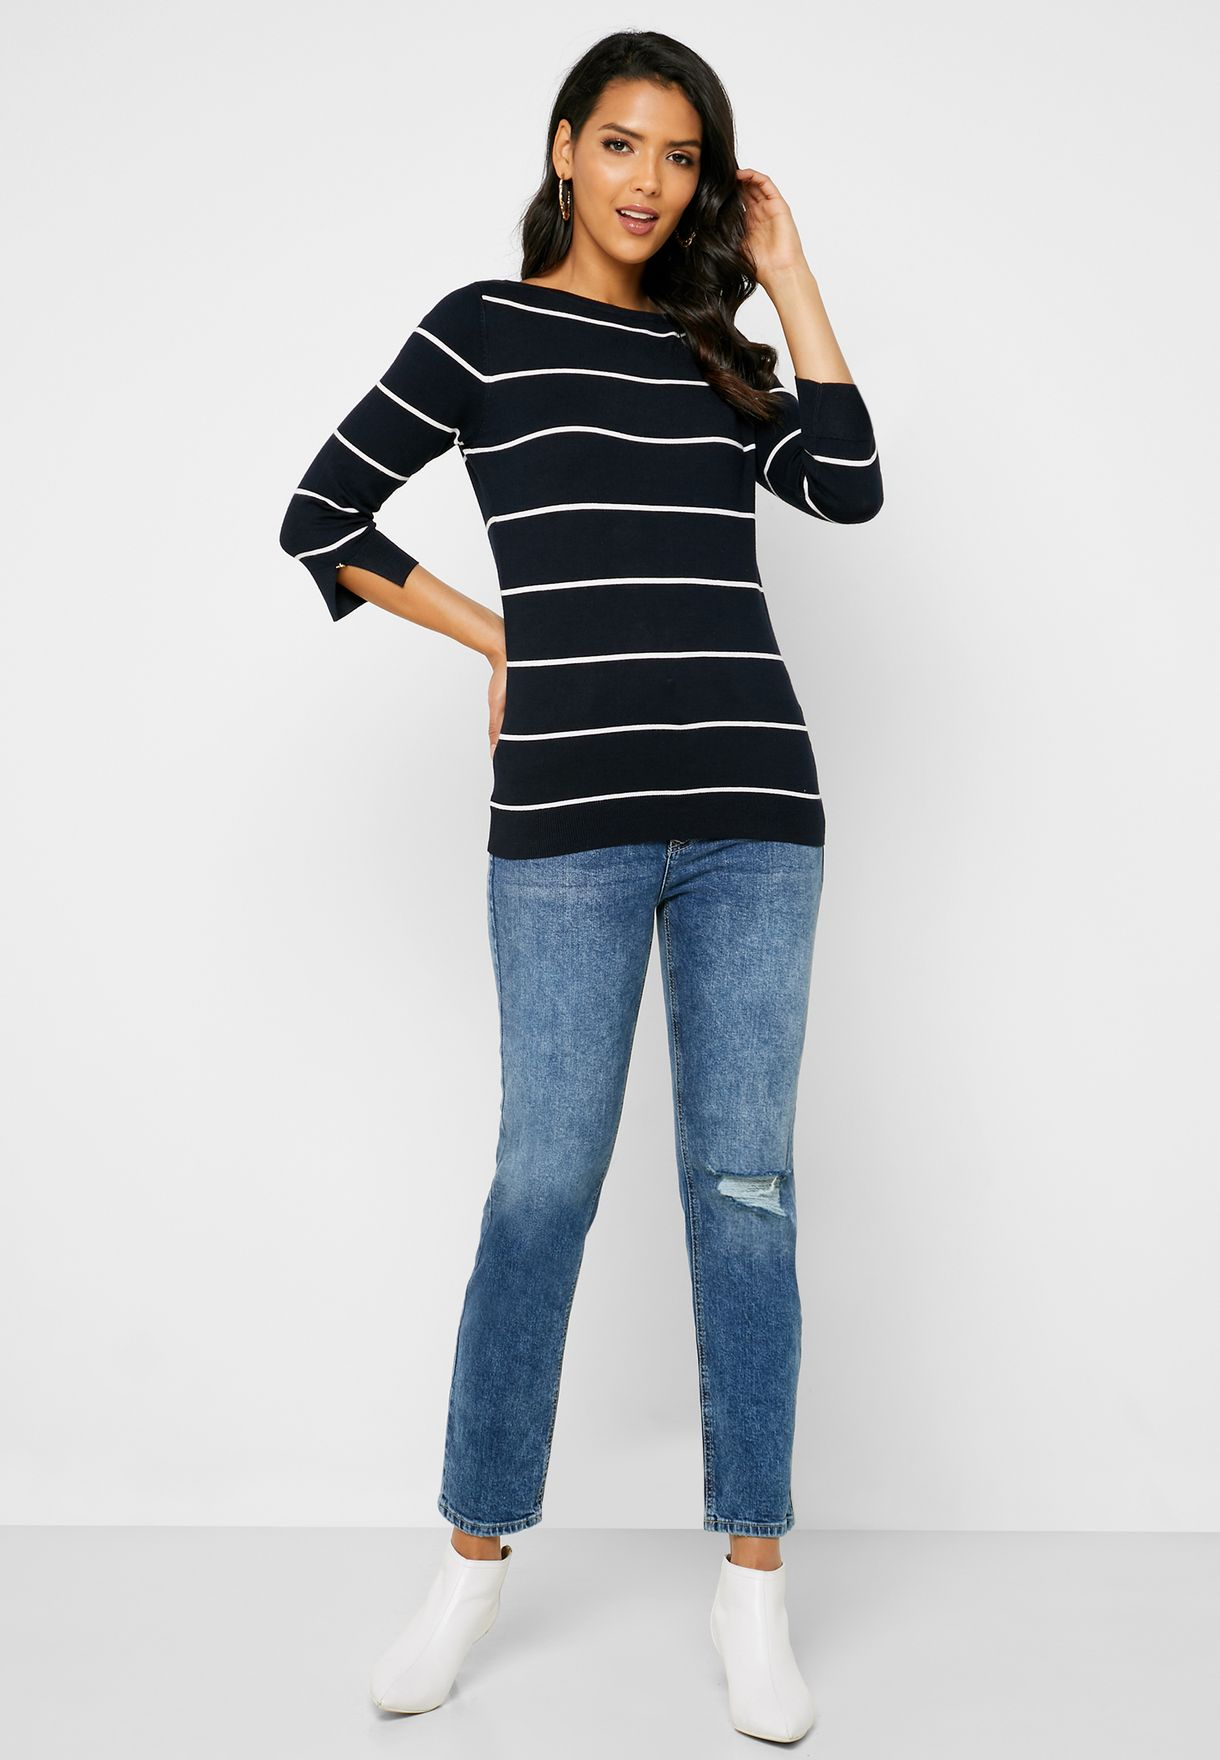 Striped 3/4 Sleeve Sweater